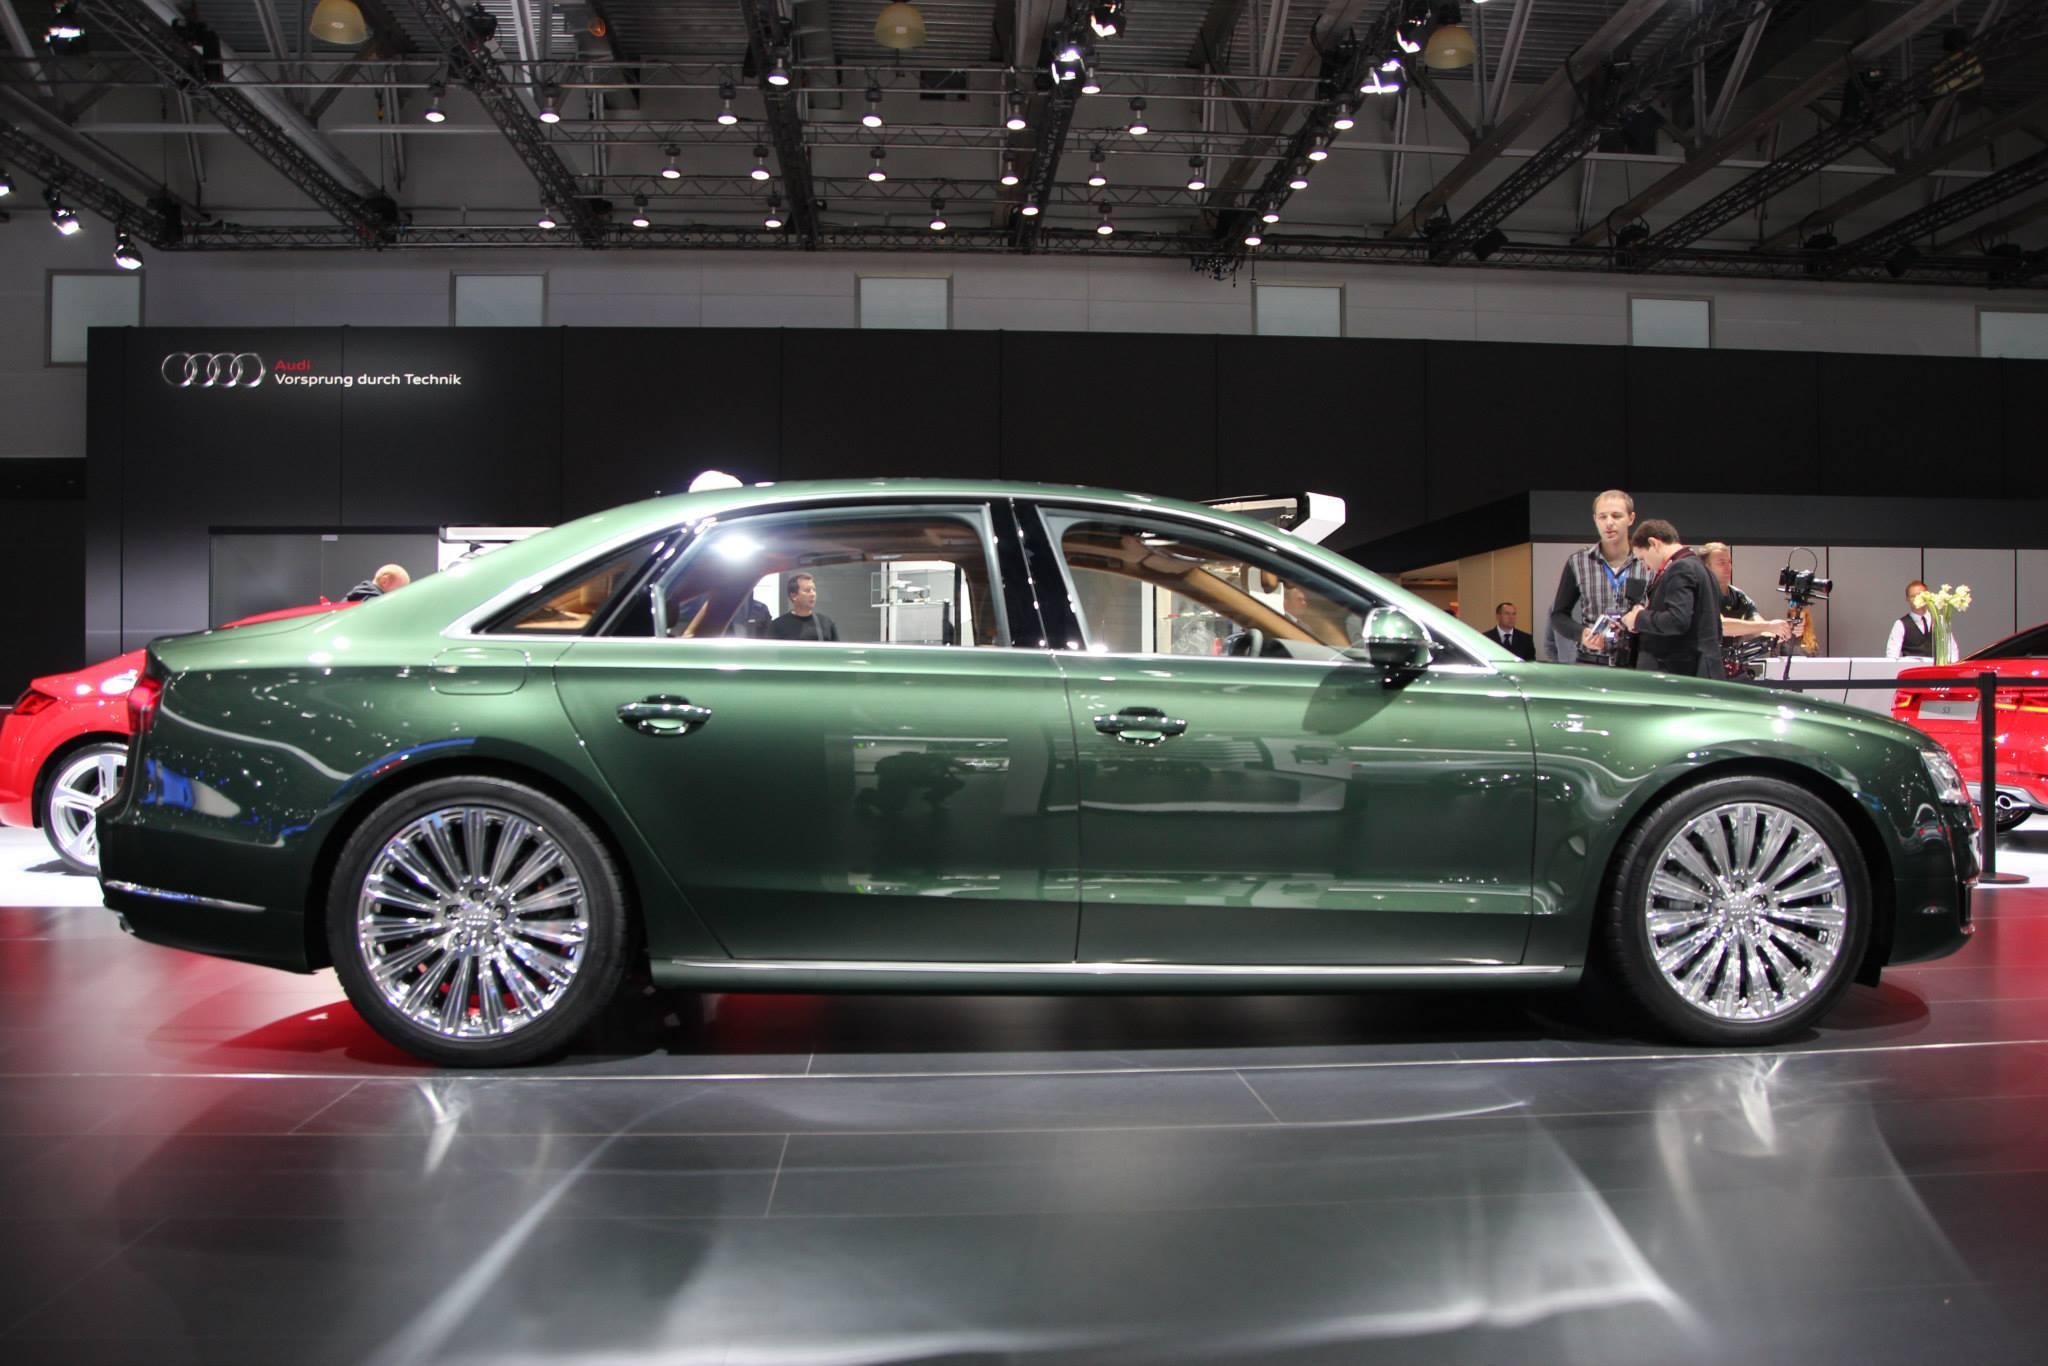 Audi A8l W12 In Verdant Green Pearl Has Jaguar Looks